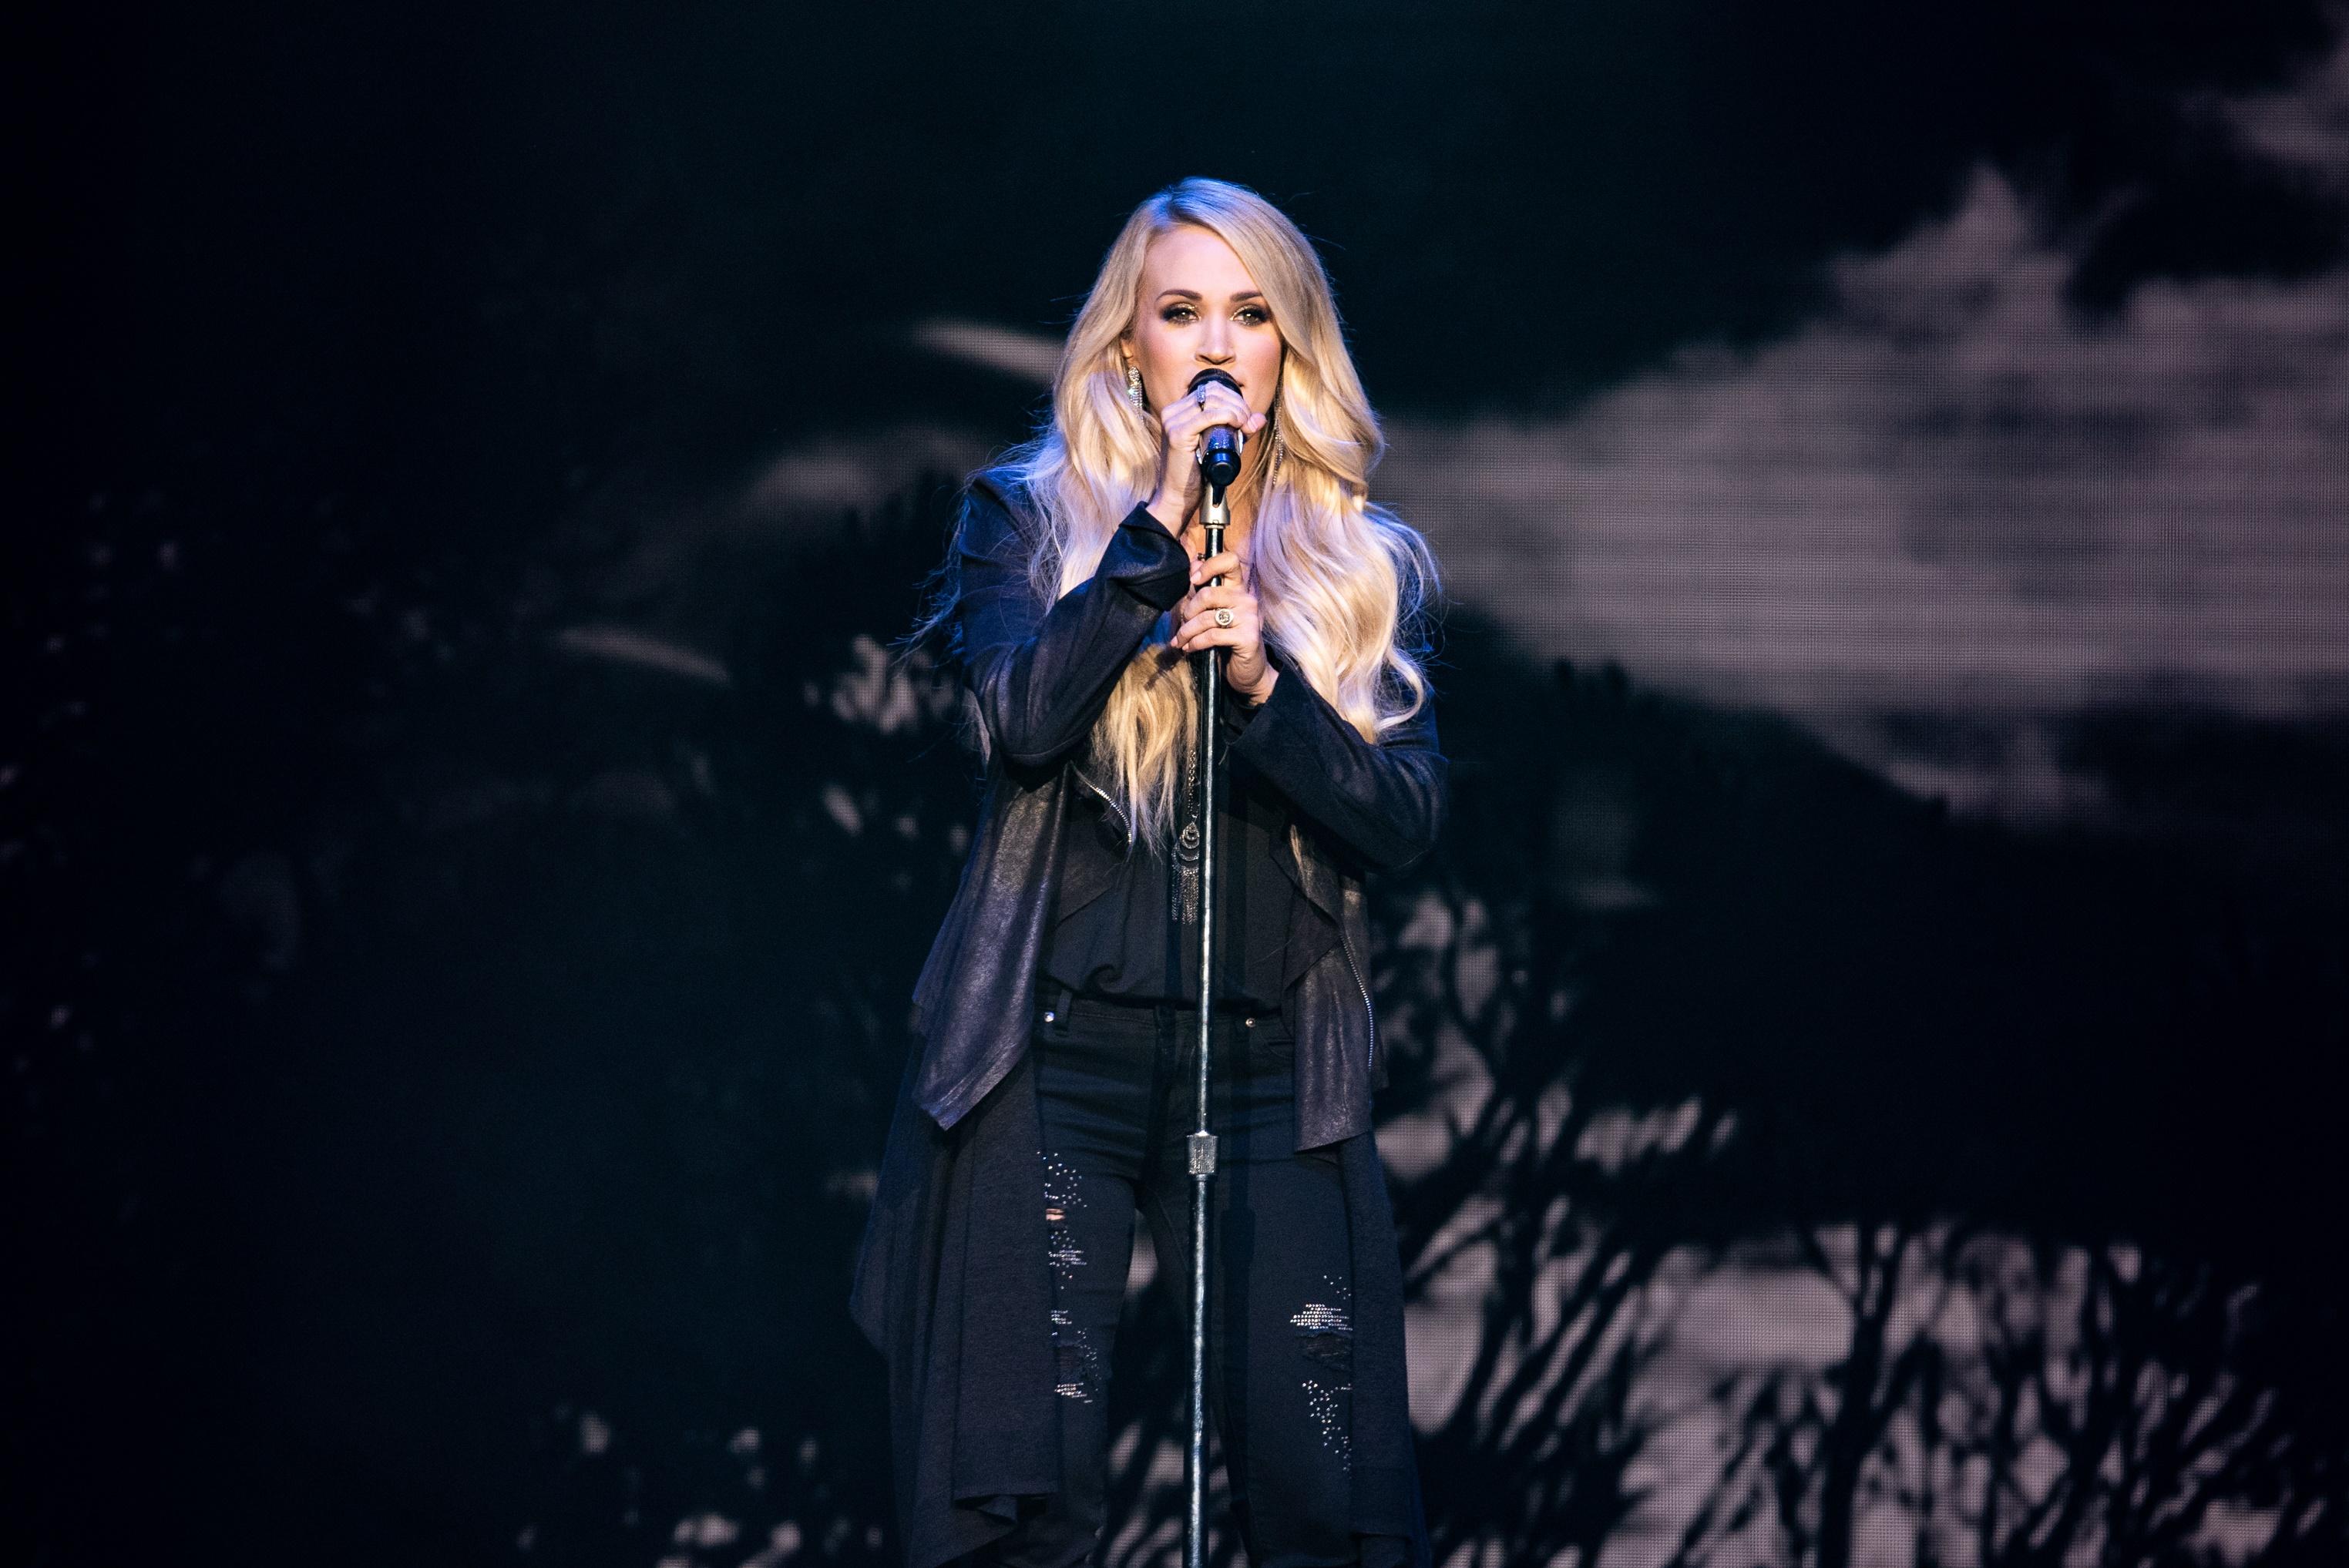 Carrie Underwood Dazzles During Atlantic City Concert